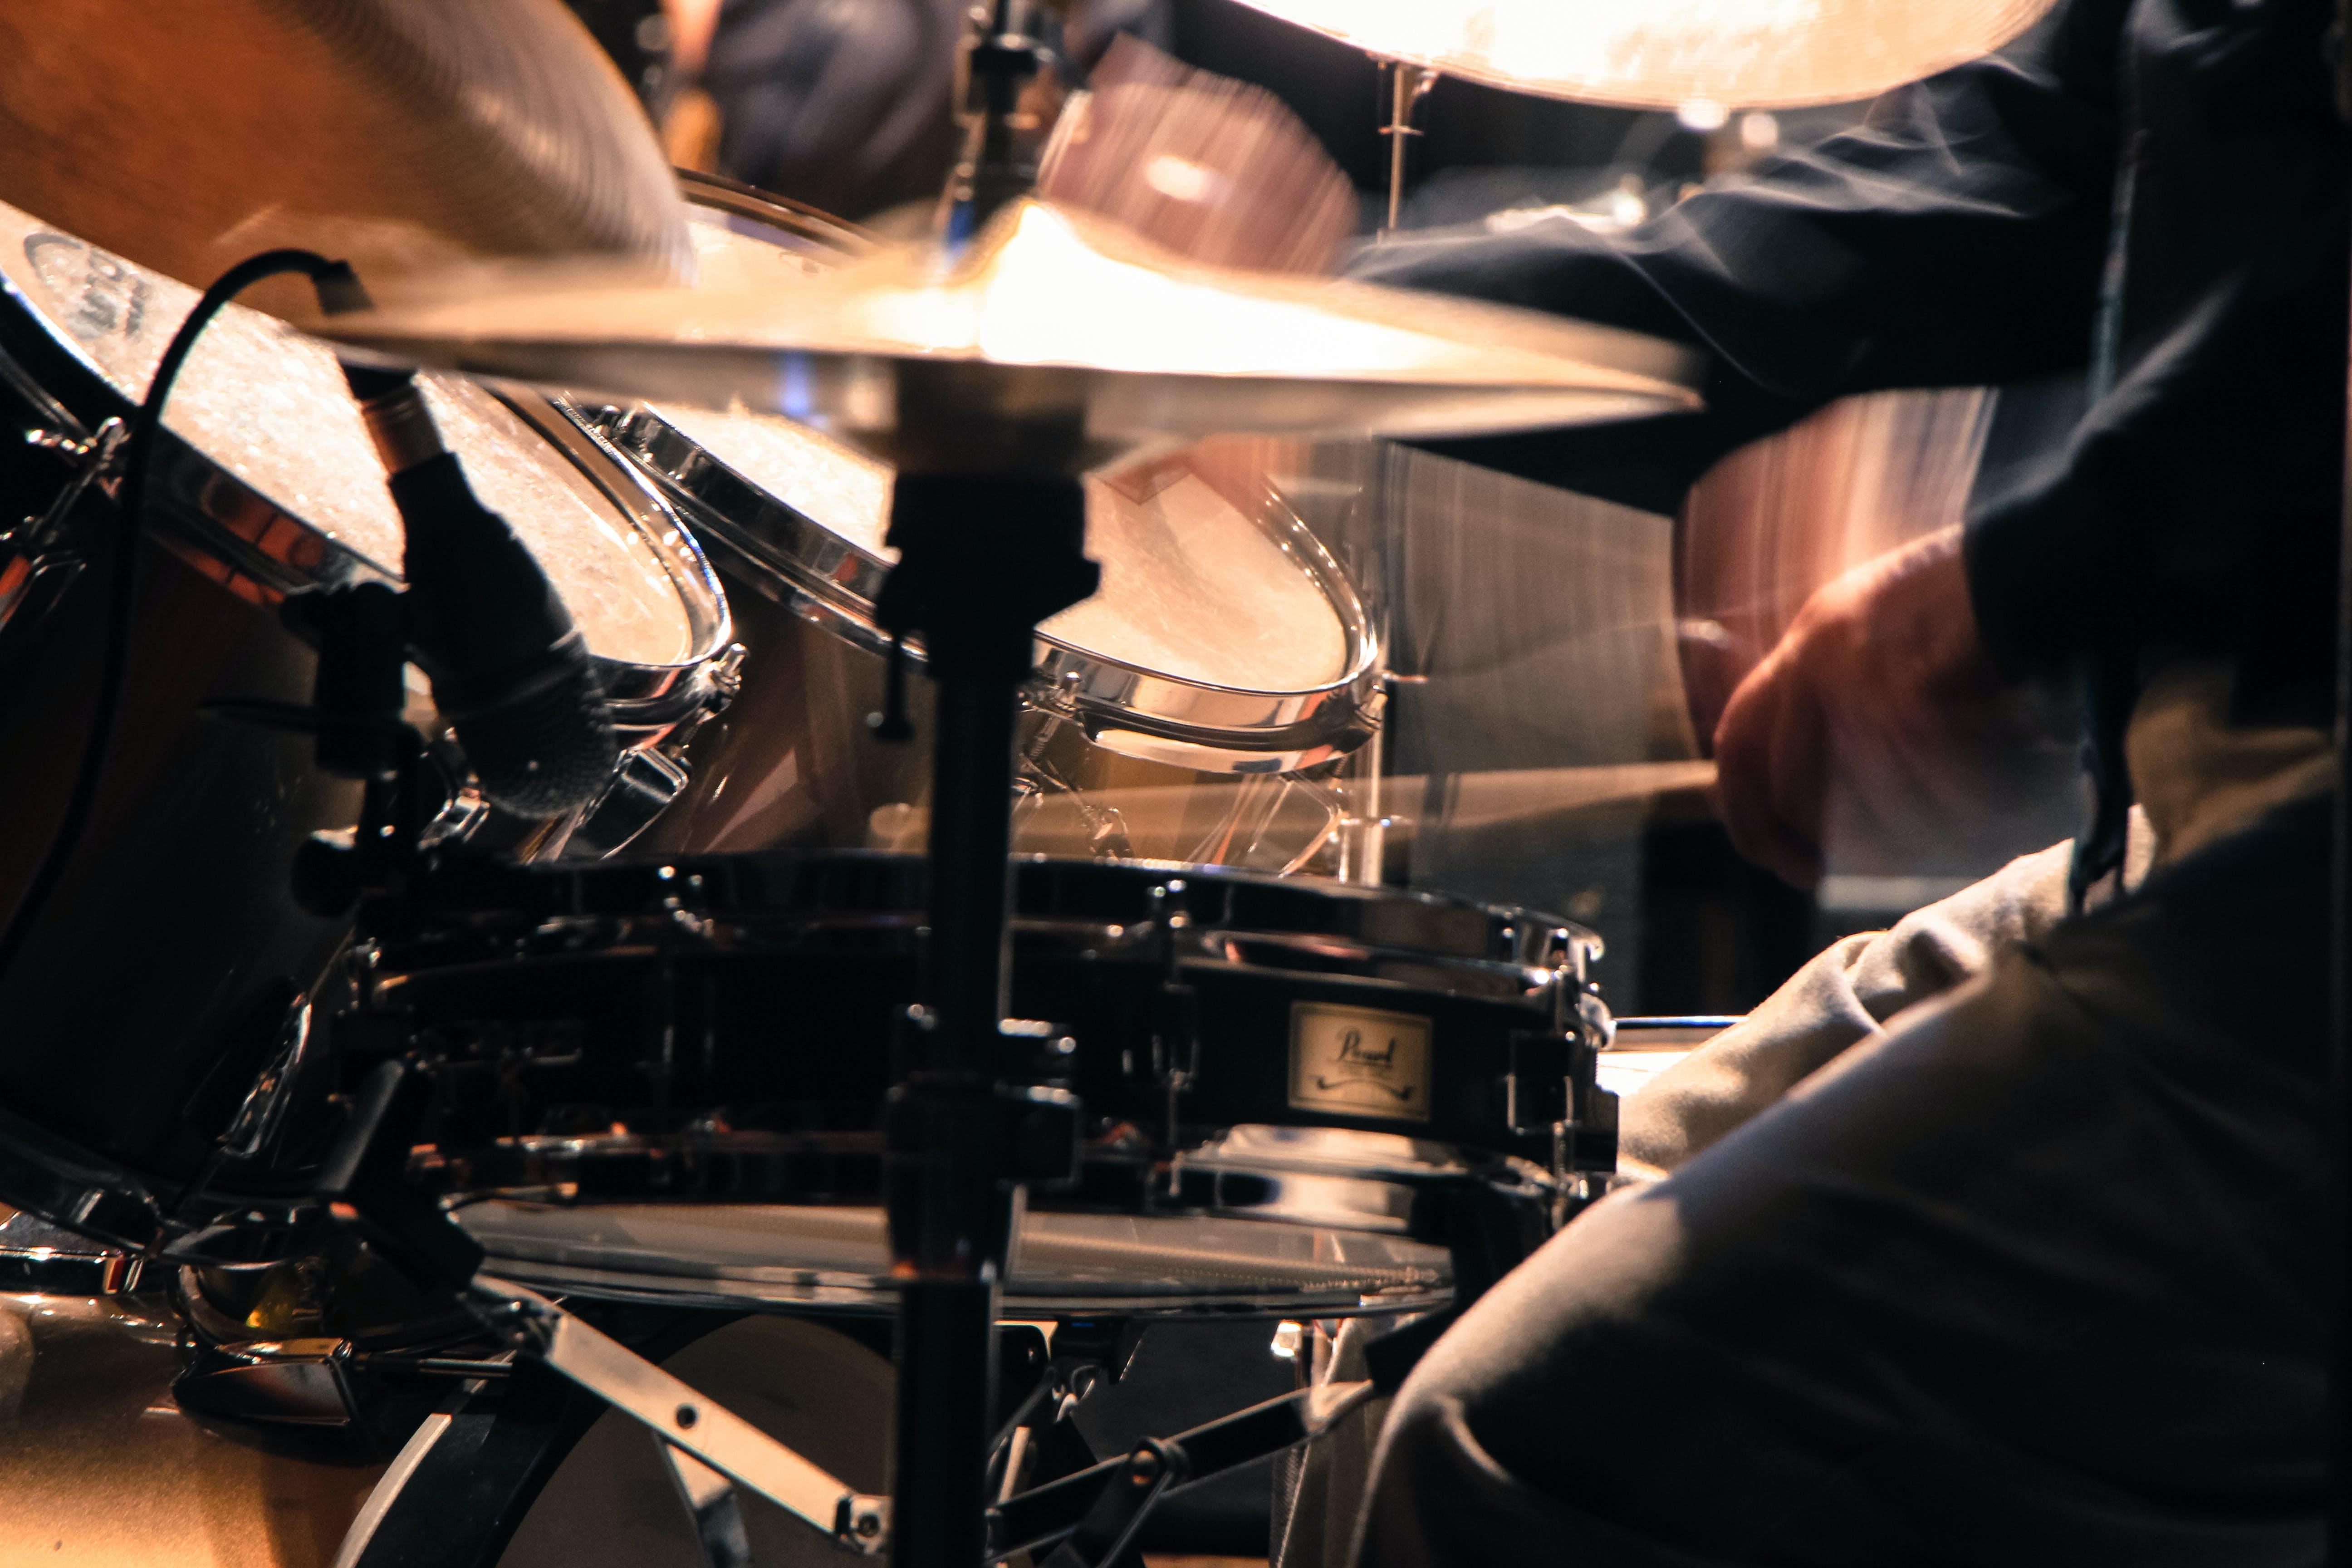 Man Performing Drum